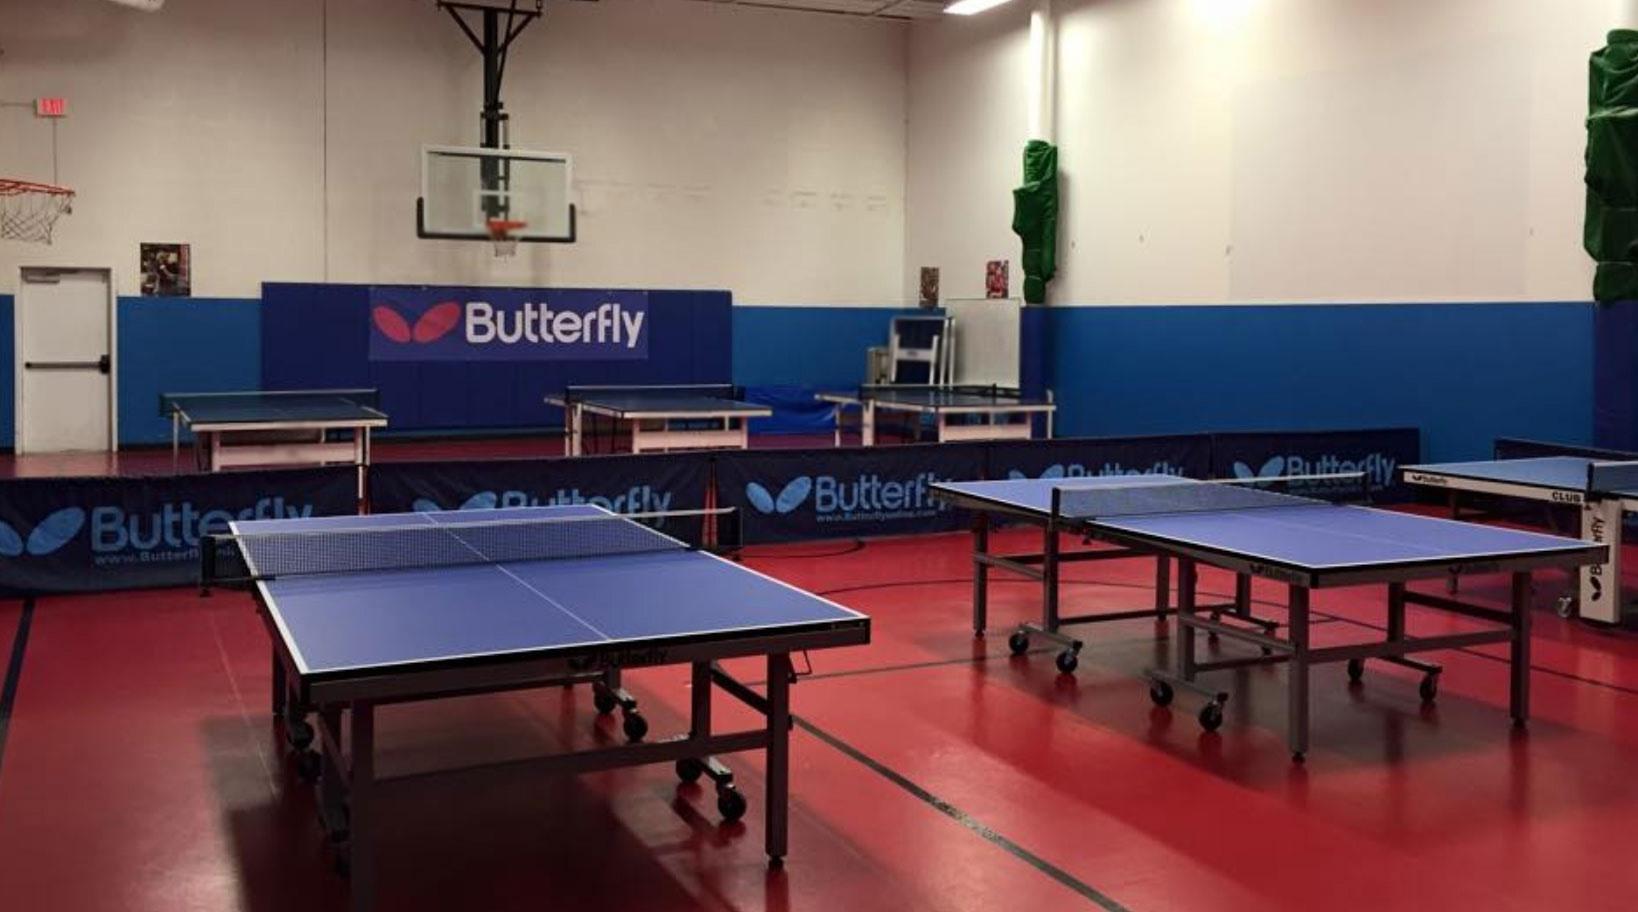 WAB CLUB FEATURE: North Texas Table Tennis Club